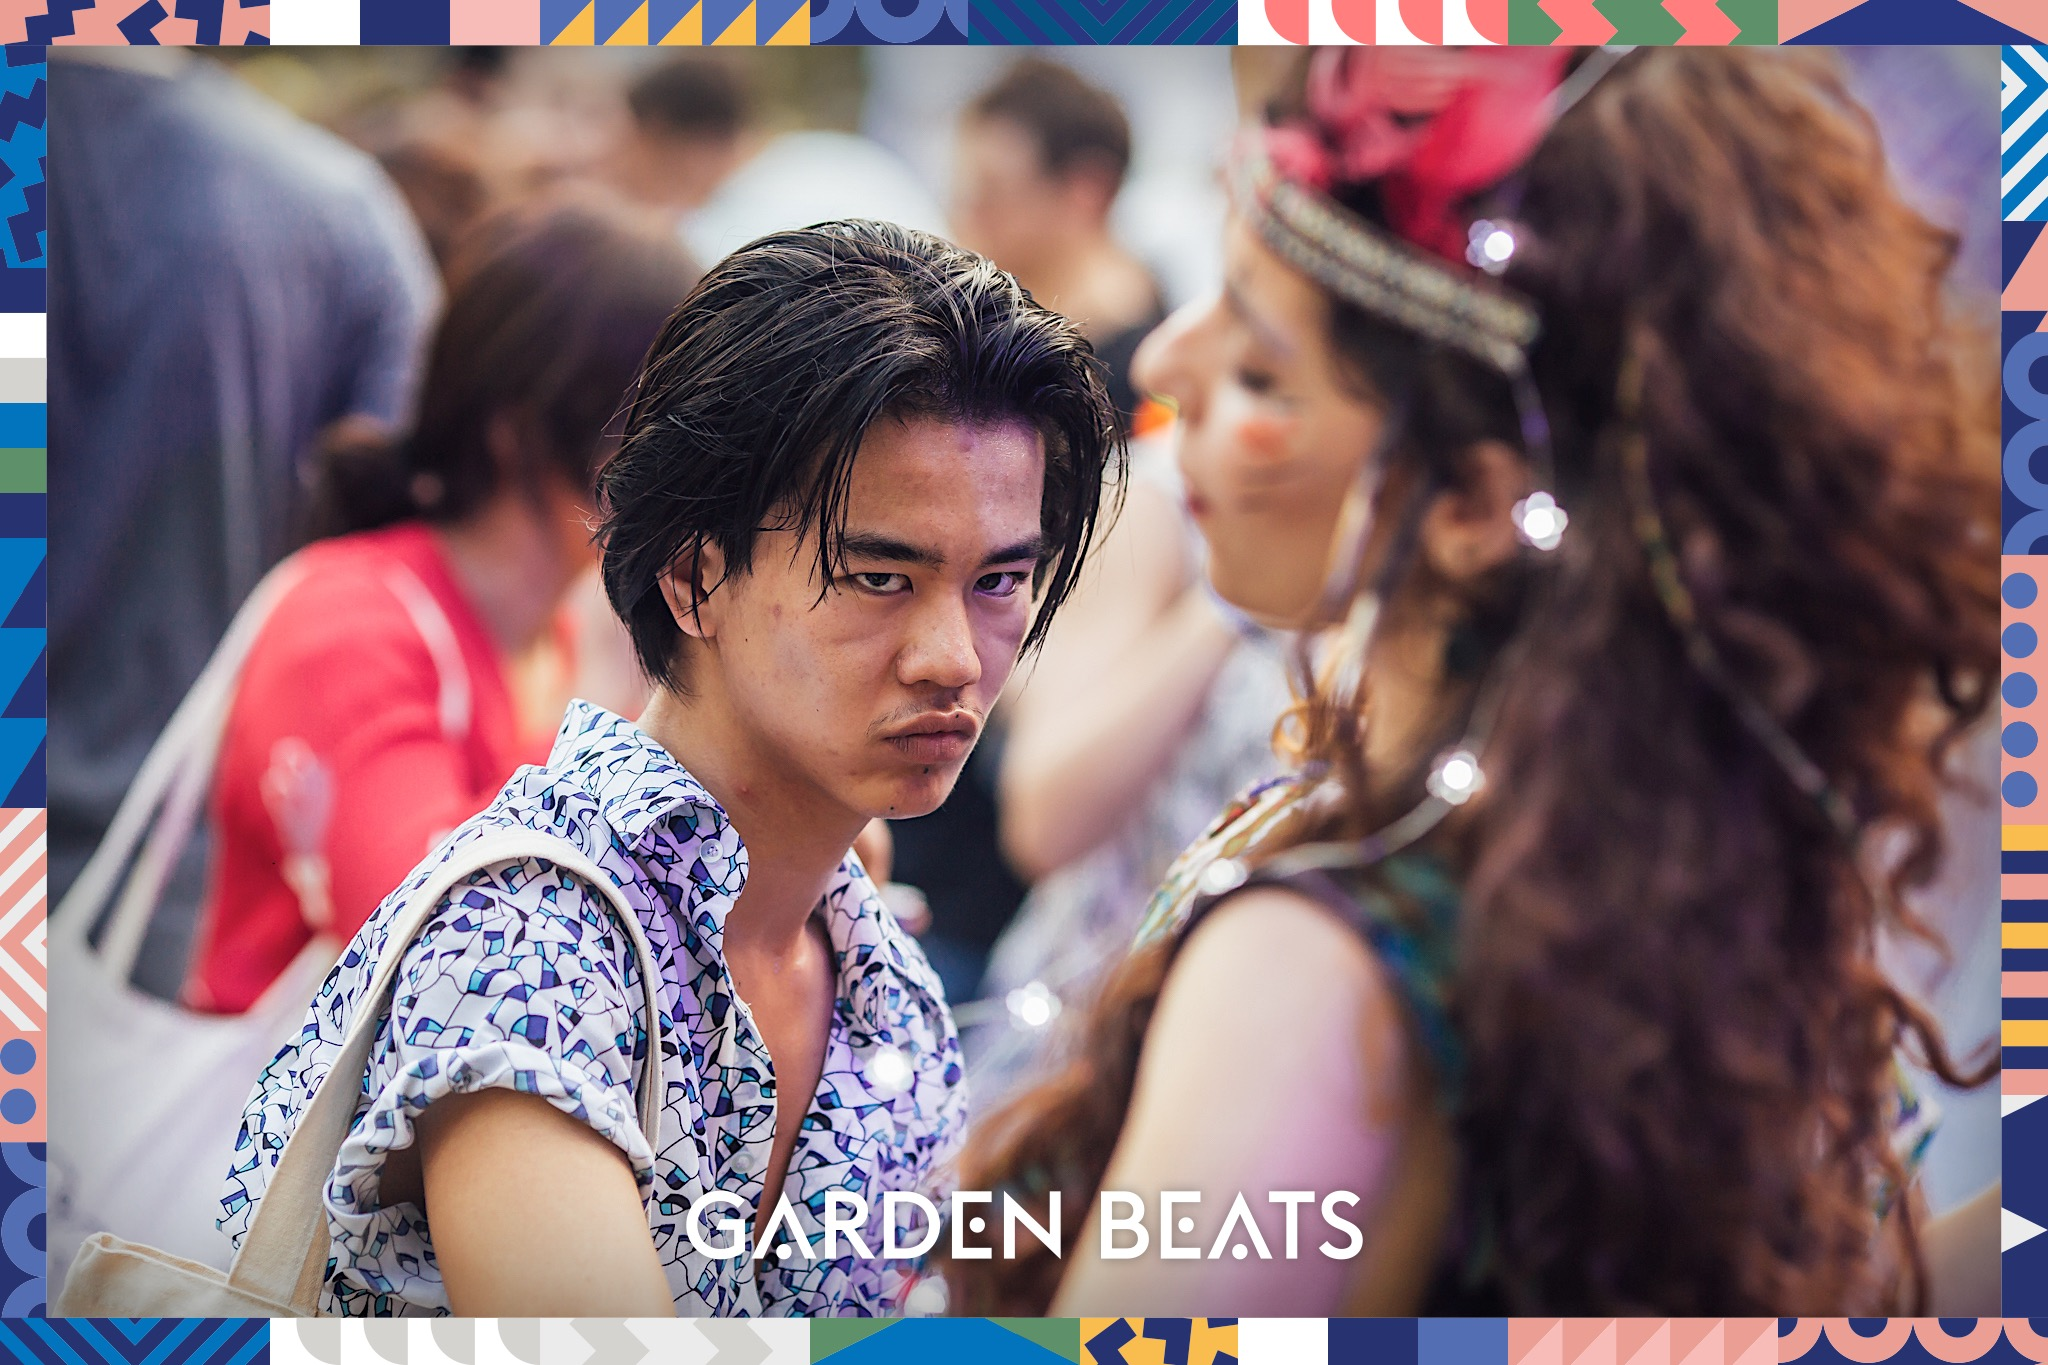 18032017_GardenBeats_Colossal596_WatermarkedGB.jpg